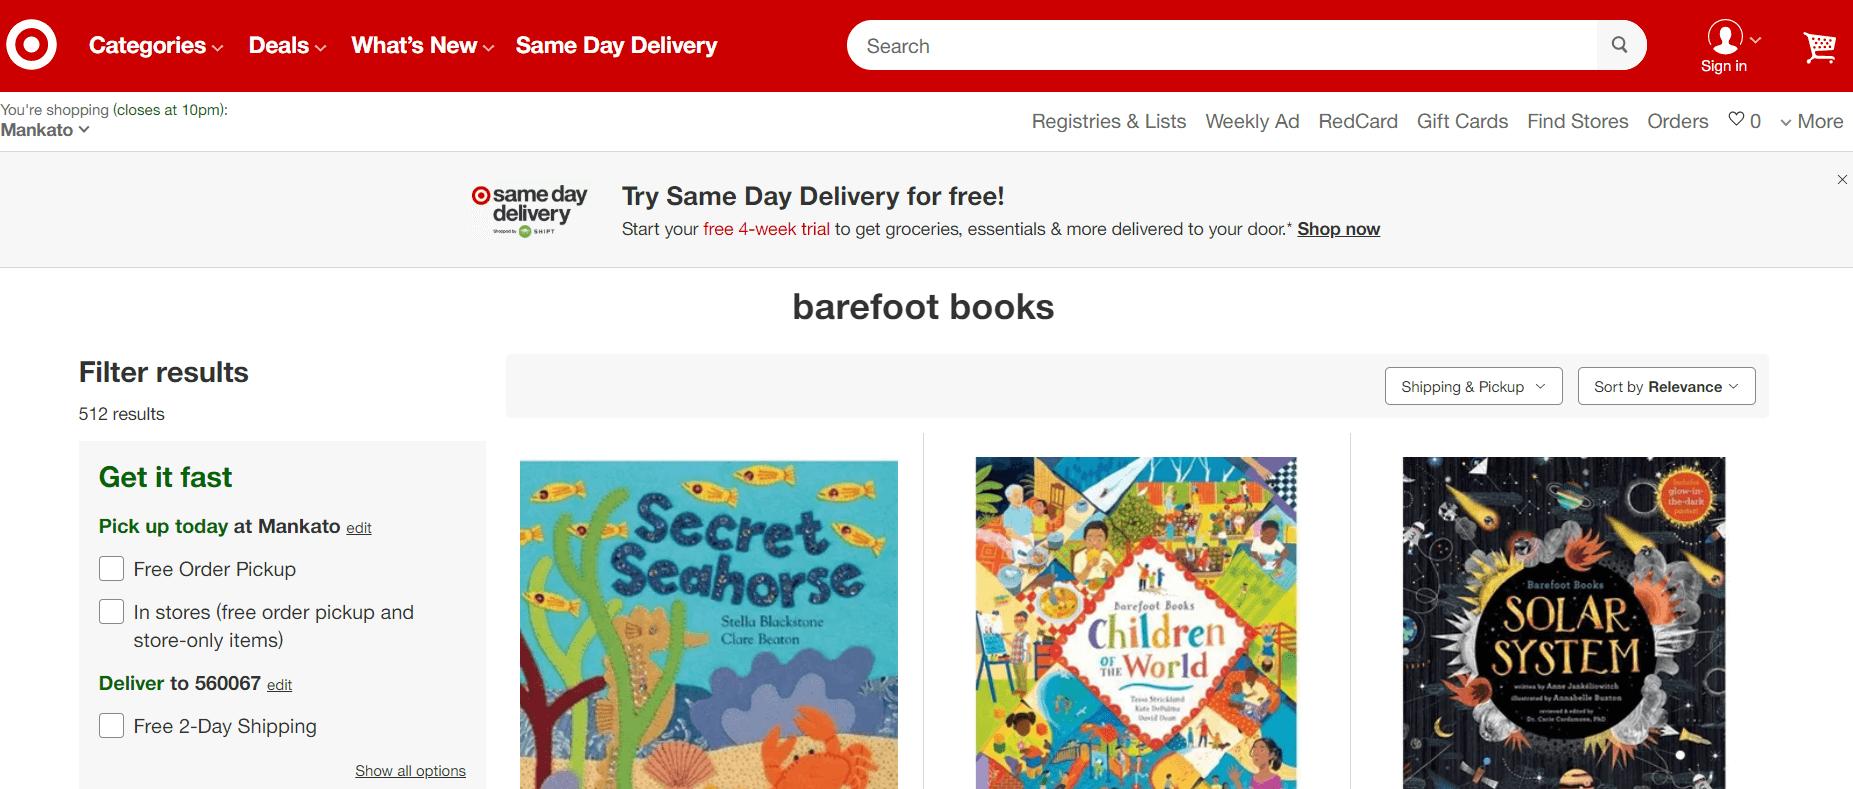 Barefoot Books